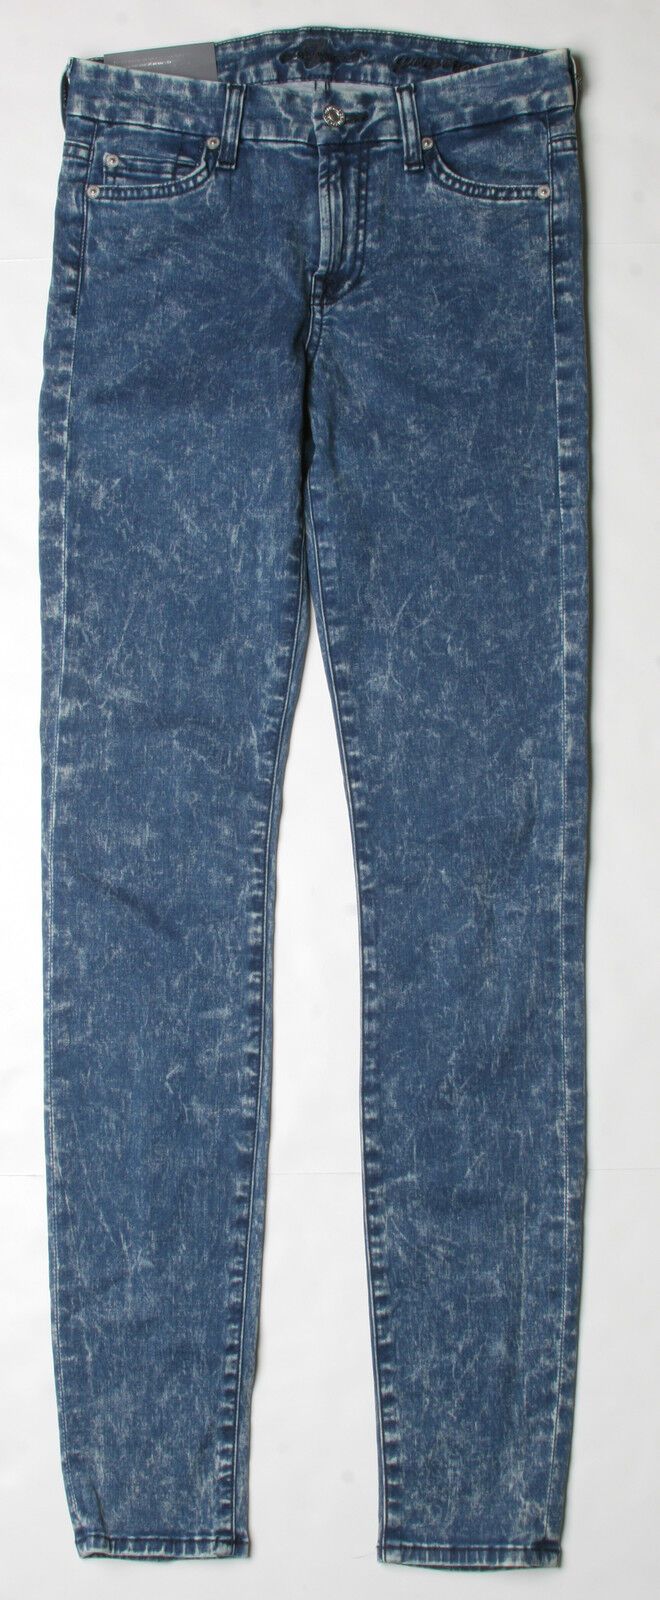 7 for all Mankind GWENEVERE Super Skinny Jeans (26) Minéral Bleu Délavé AU0168660